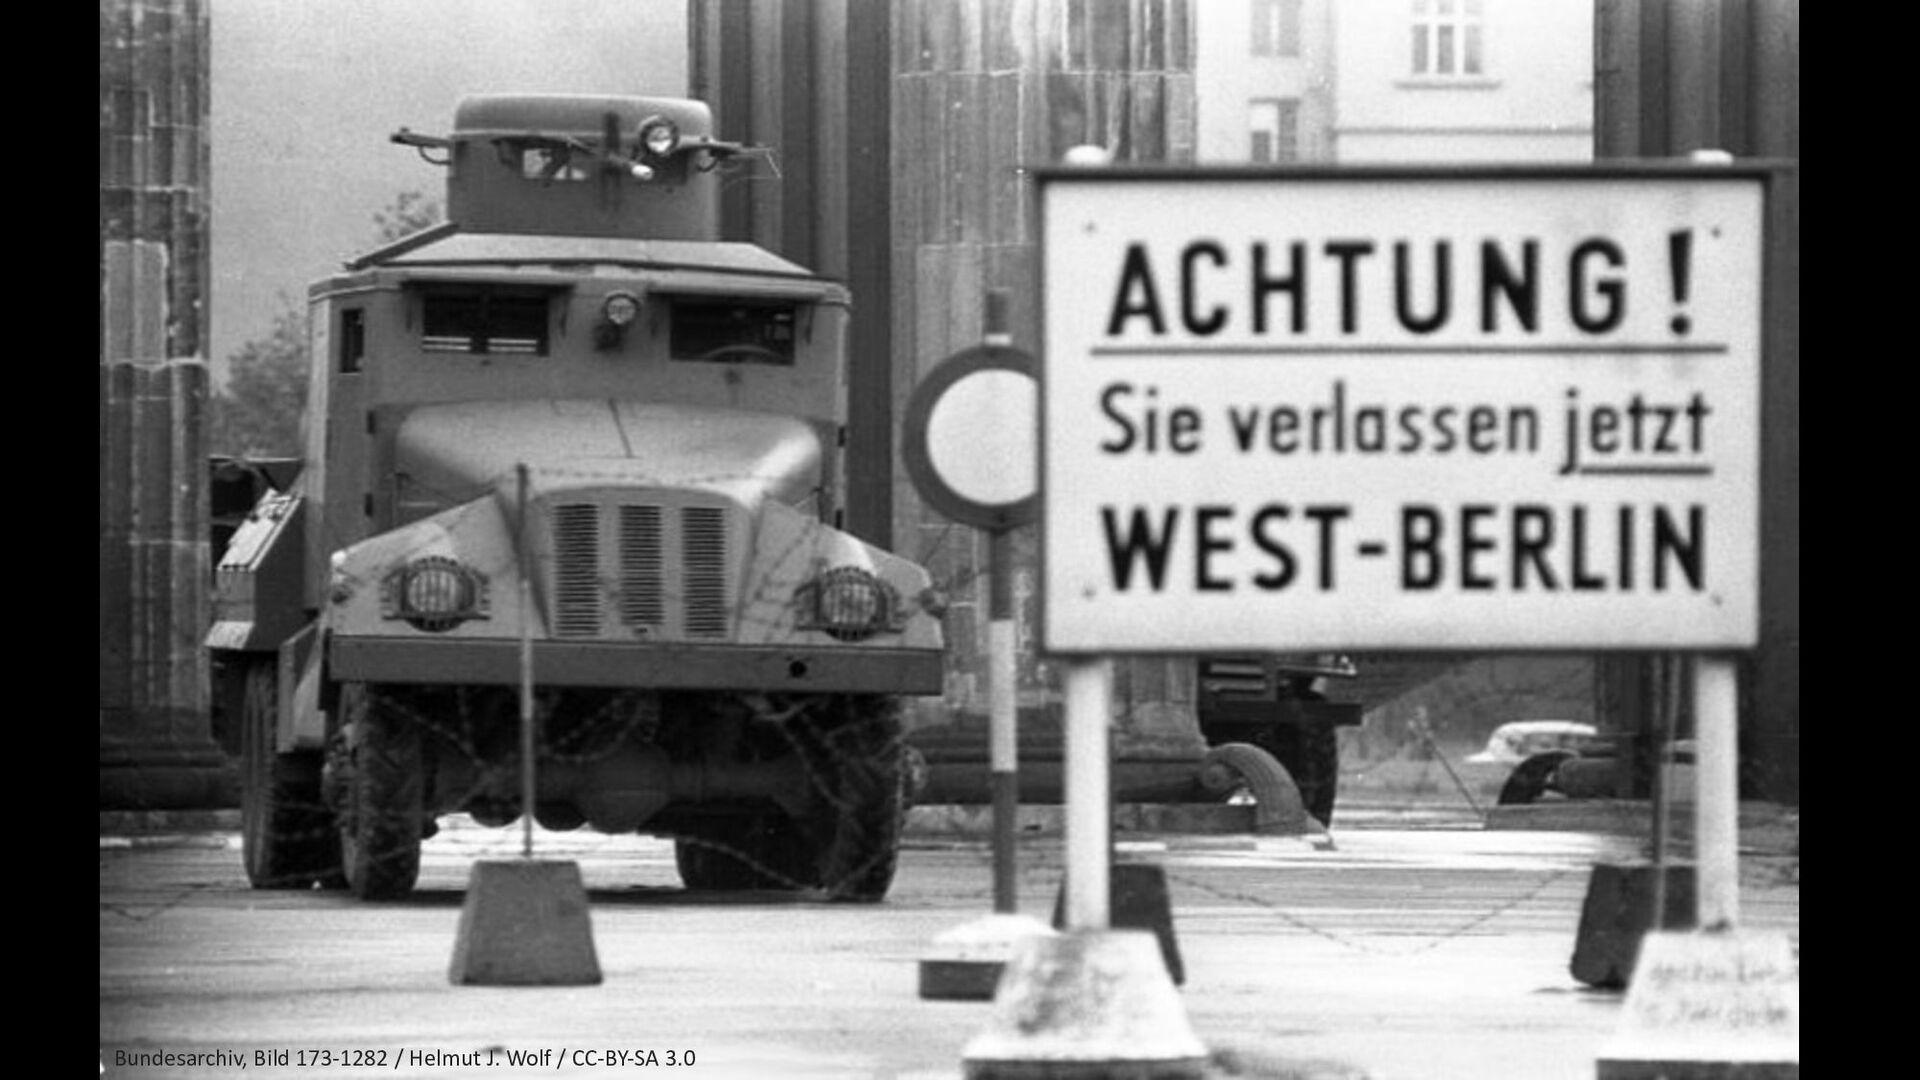 @hschwentner Model?